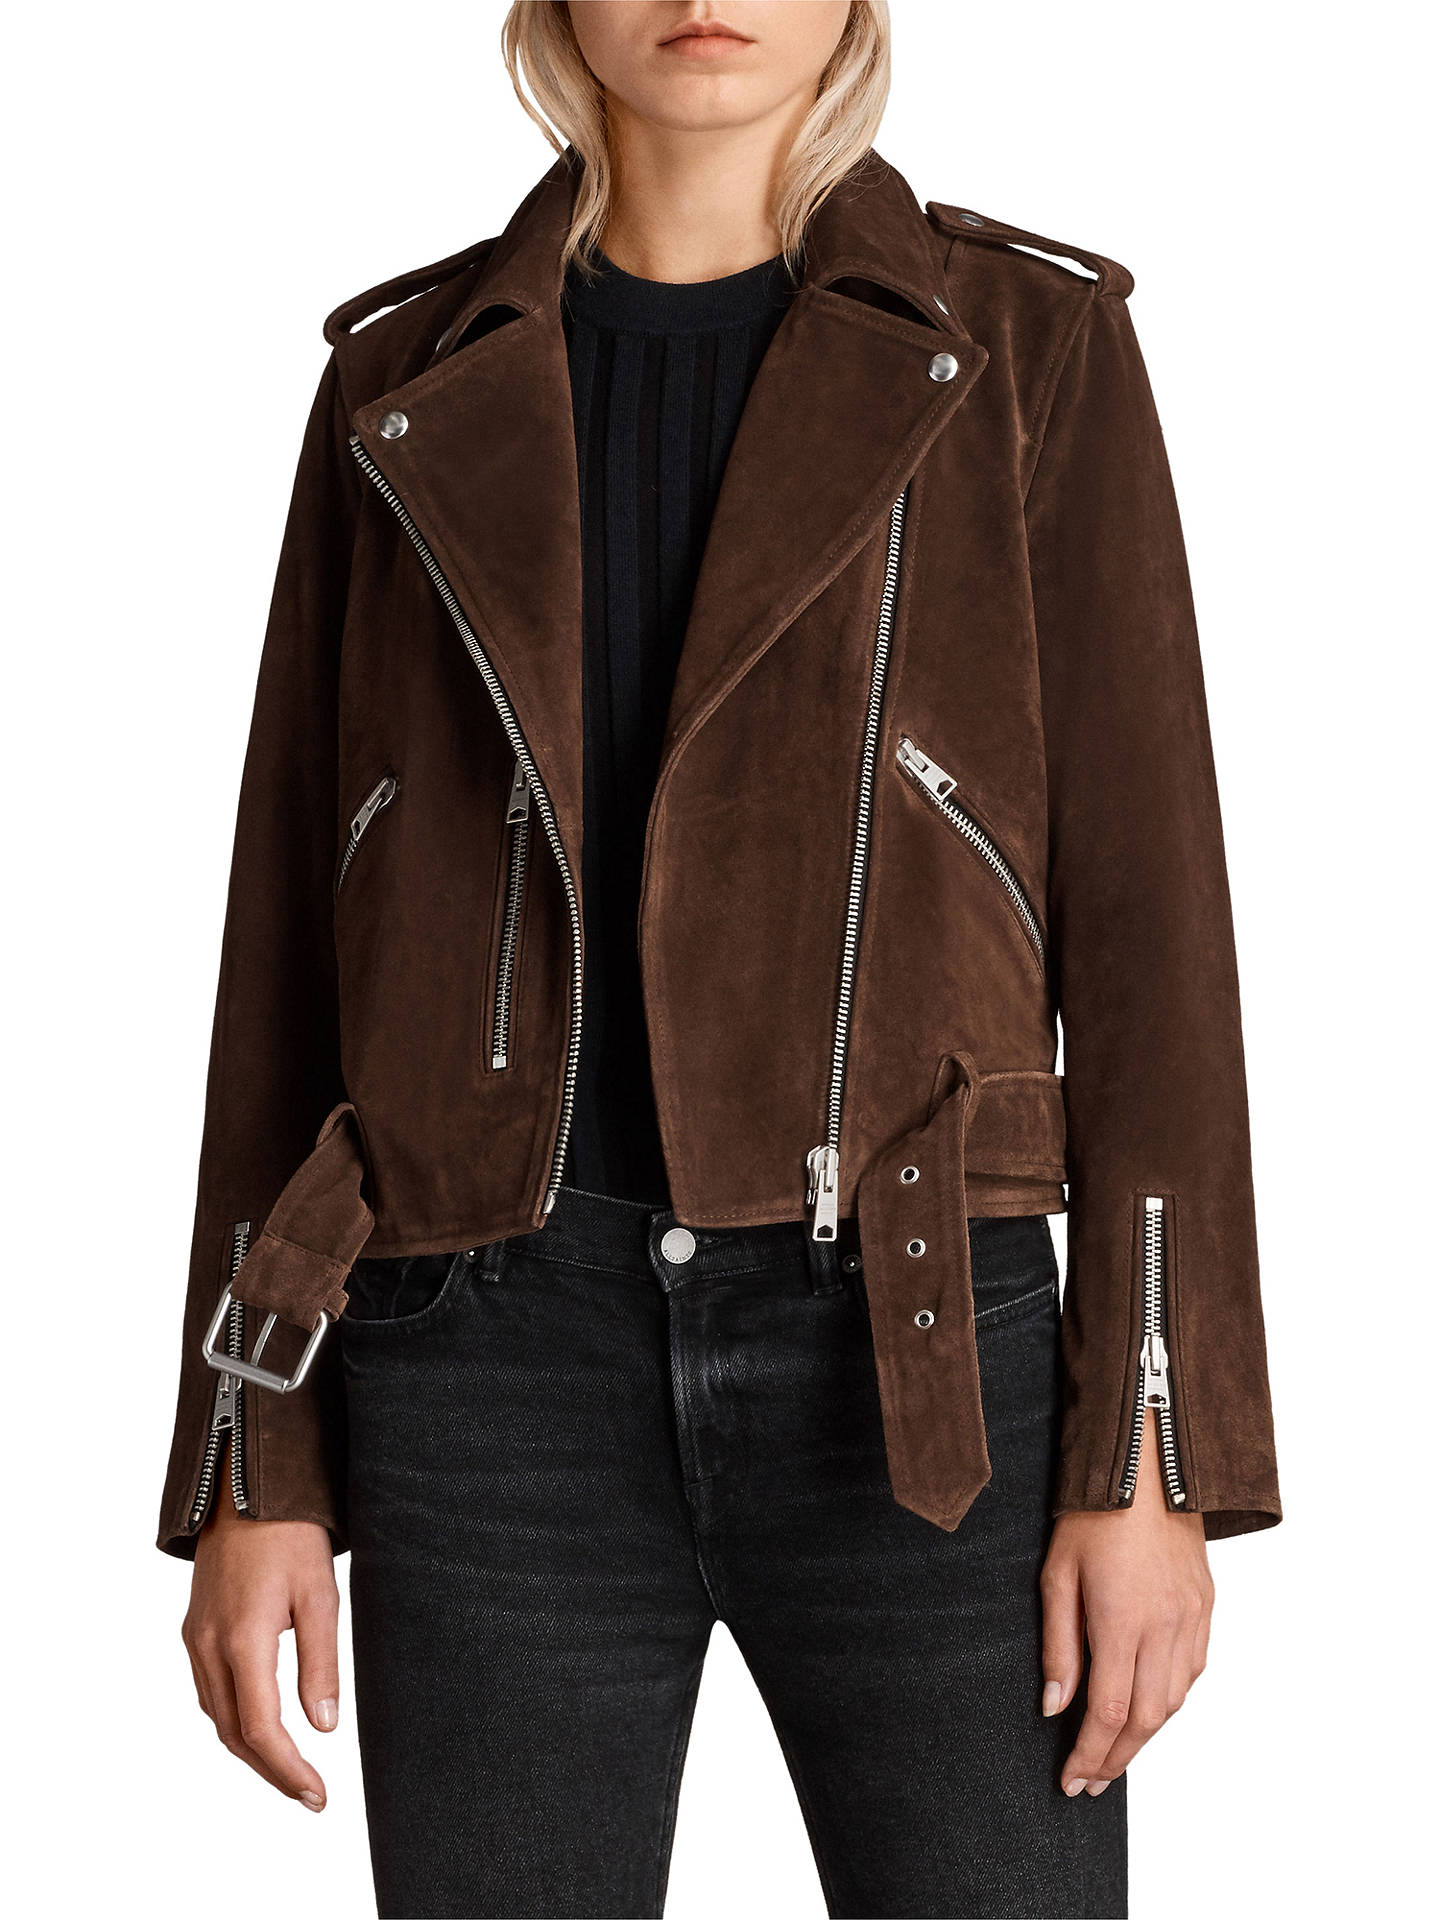 f07878a350e Buy AllSaints Suede Balfern Biker Jacket, Mahogany Brown, 6 Online at  johnlewis.com ...